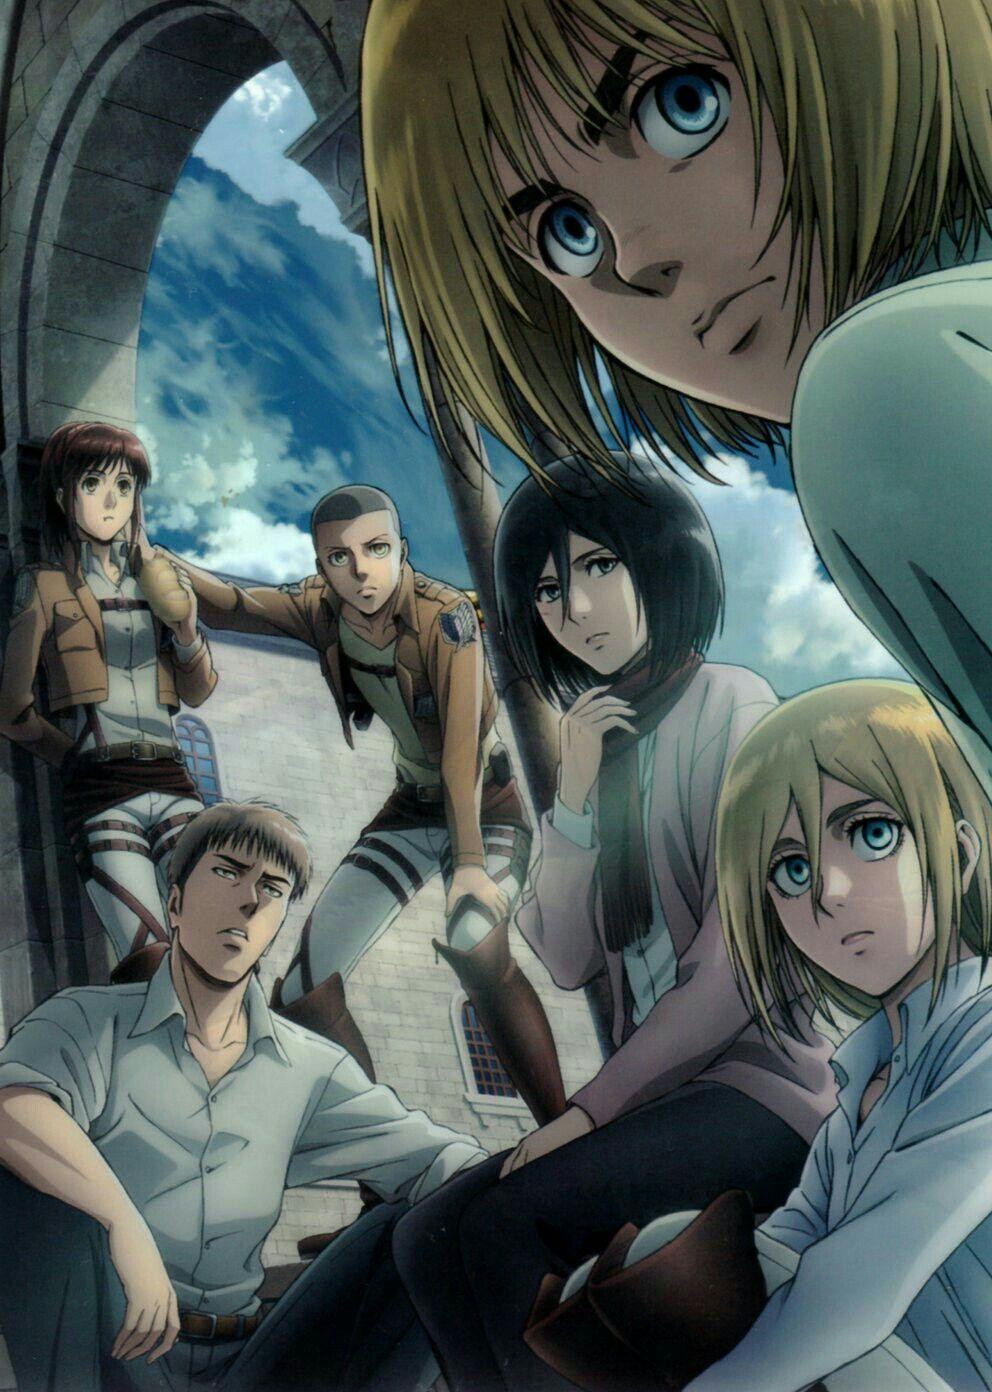 Armin Mikasa Jean Historia Sasha Connie Attack In Titan 2 Dvd Image 1 Gambar Anime Cara Menggambar Animasi